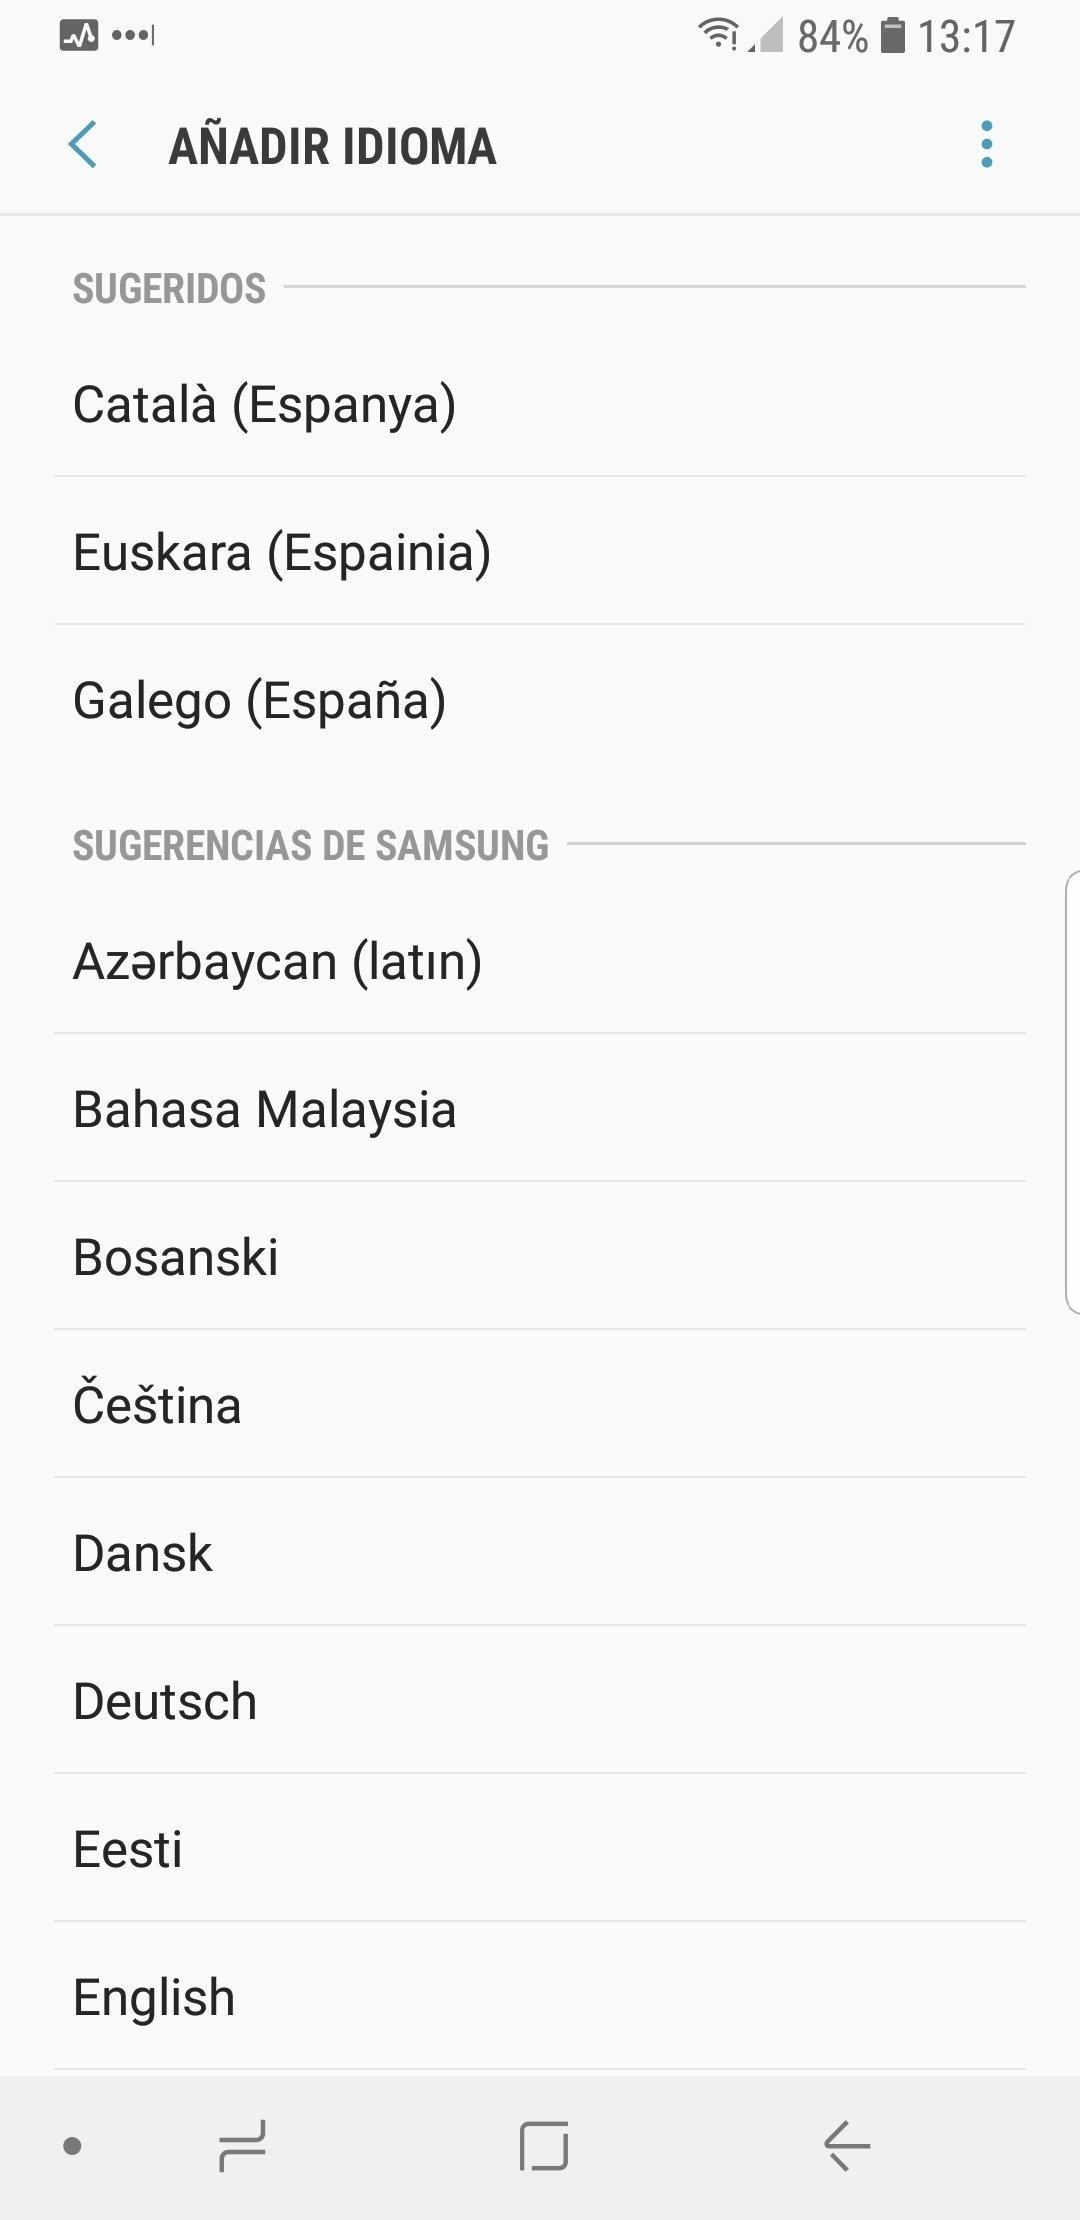 Lista de idiomas soportados por Android